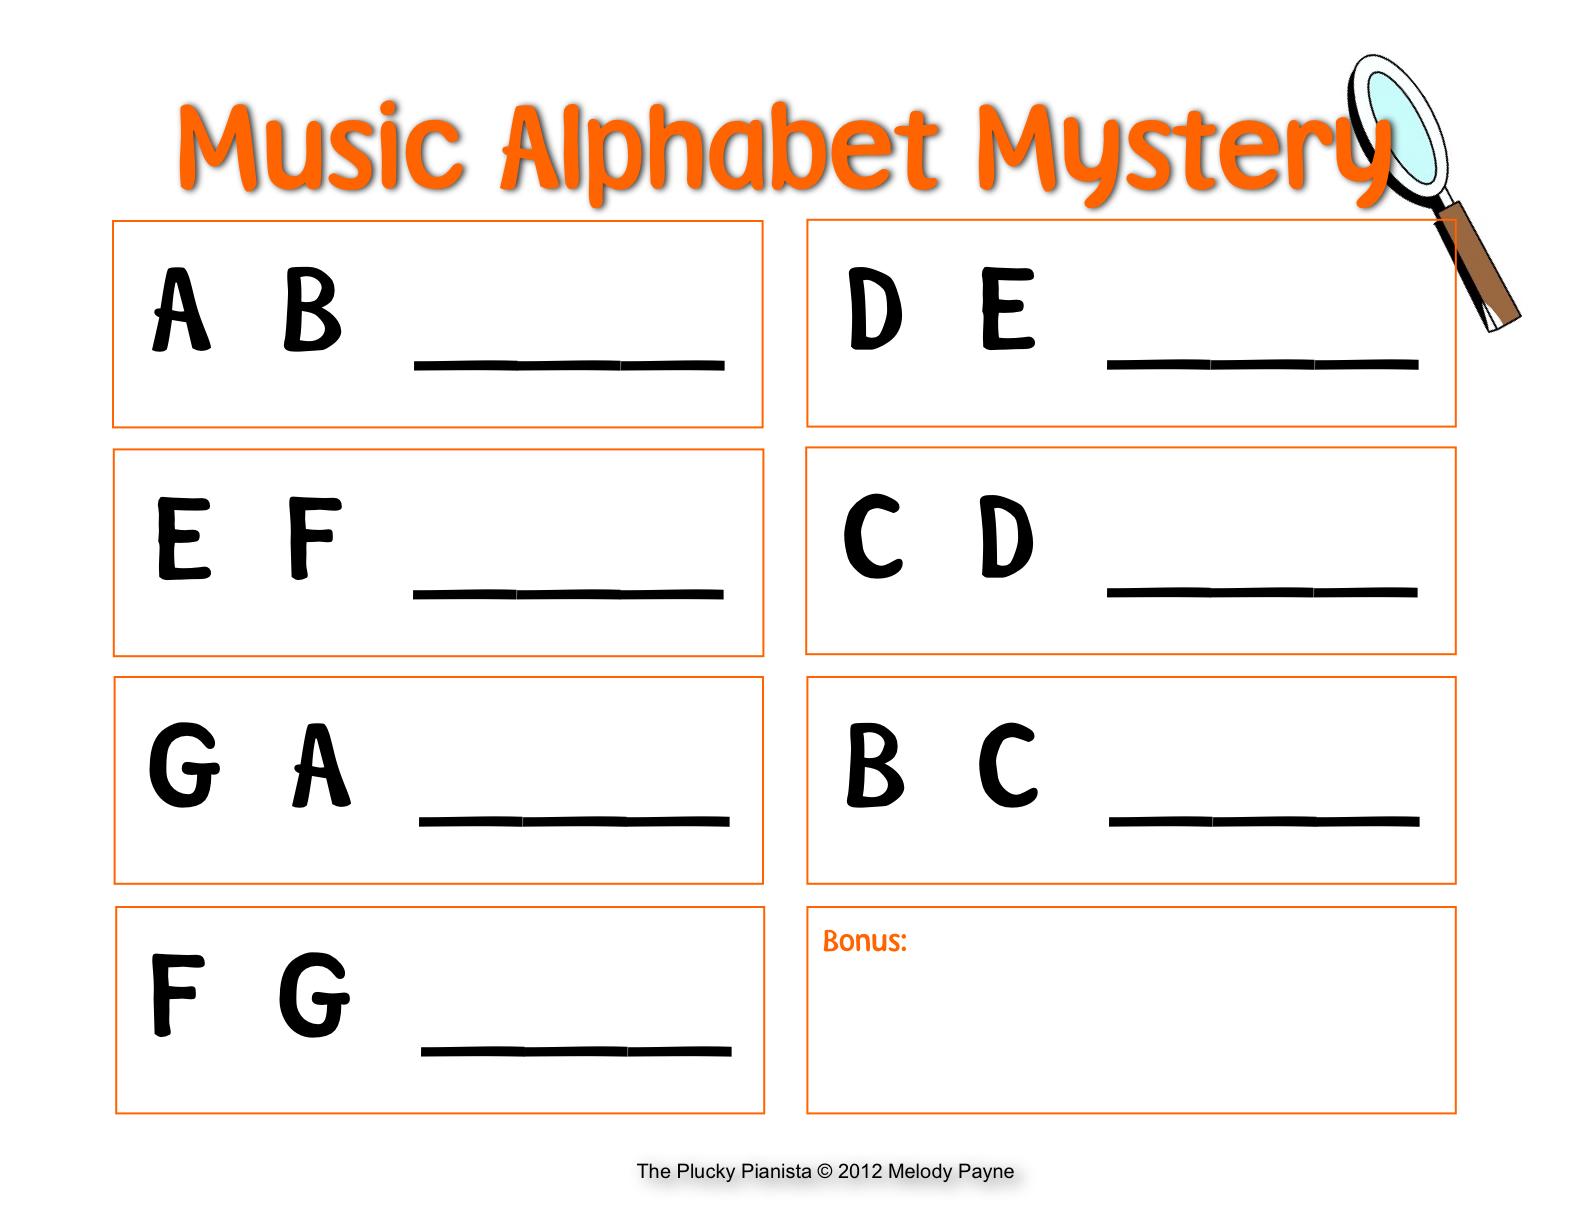 Music Alphabet Mystery